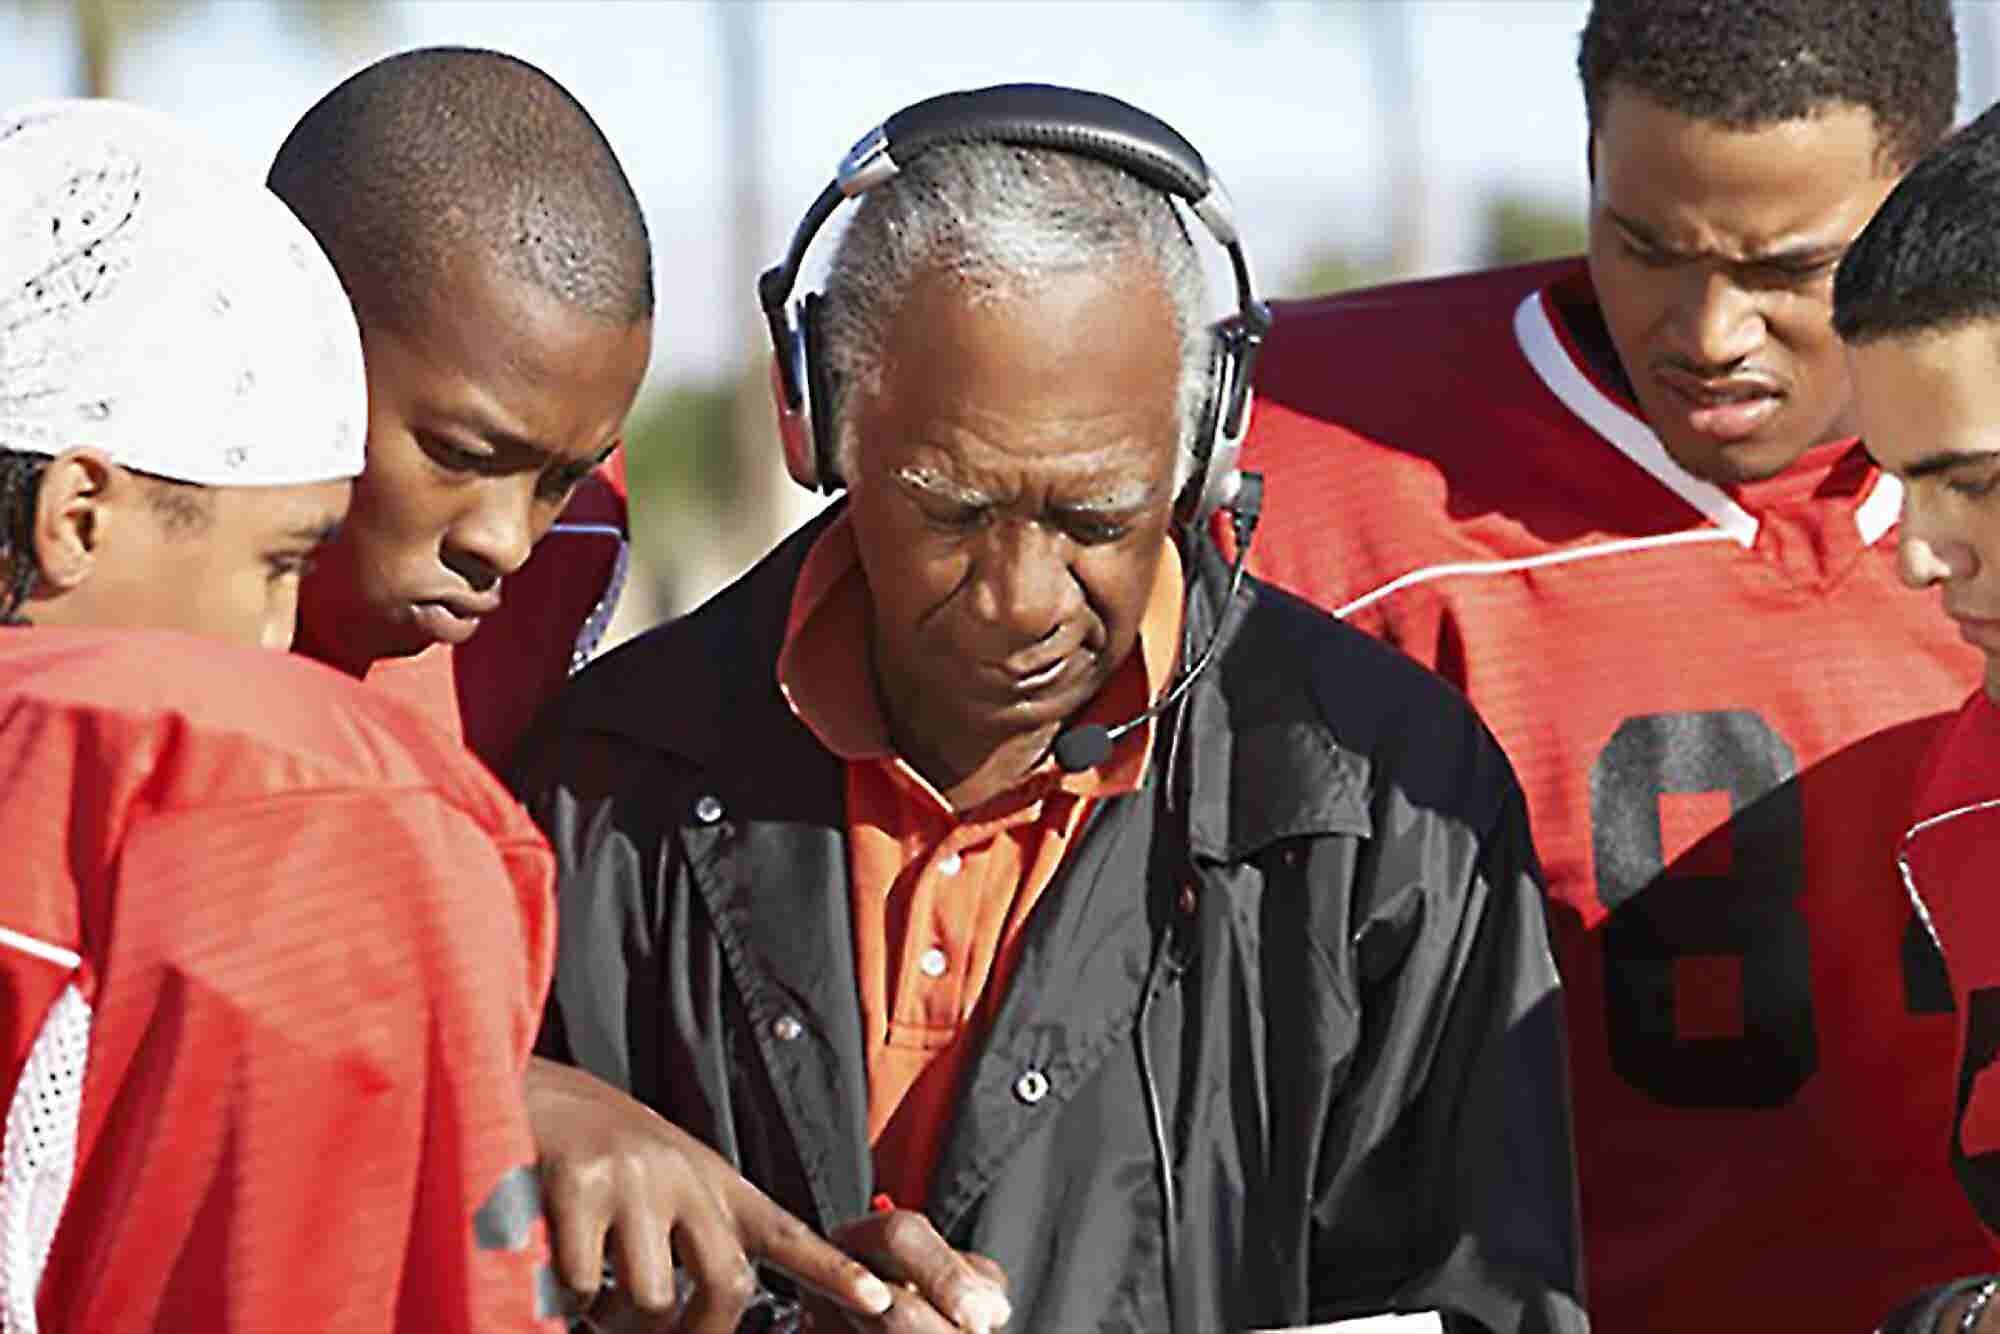 Before Hiring a Business Coach Make Certain Their Skills Match Your Goals